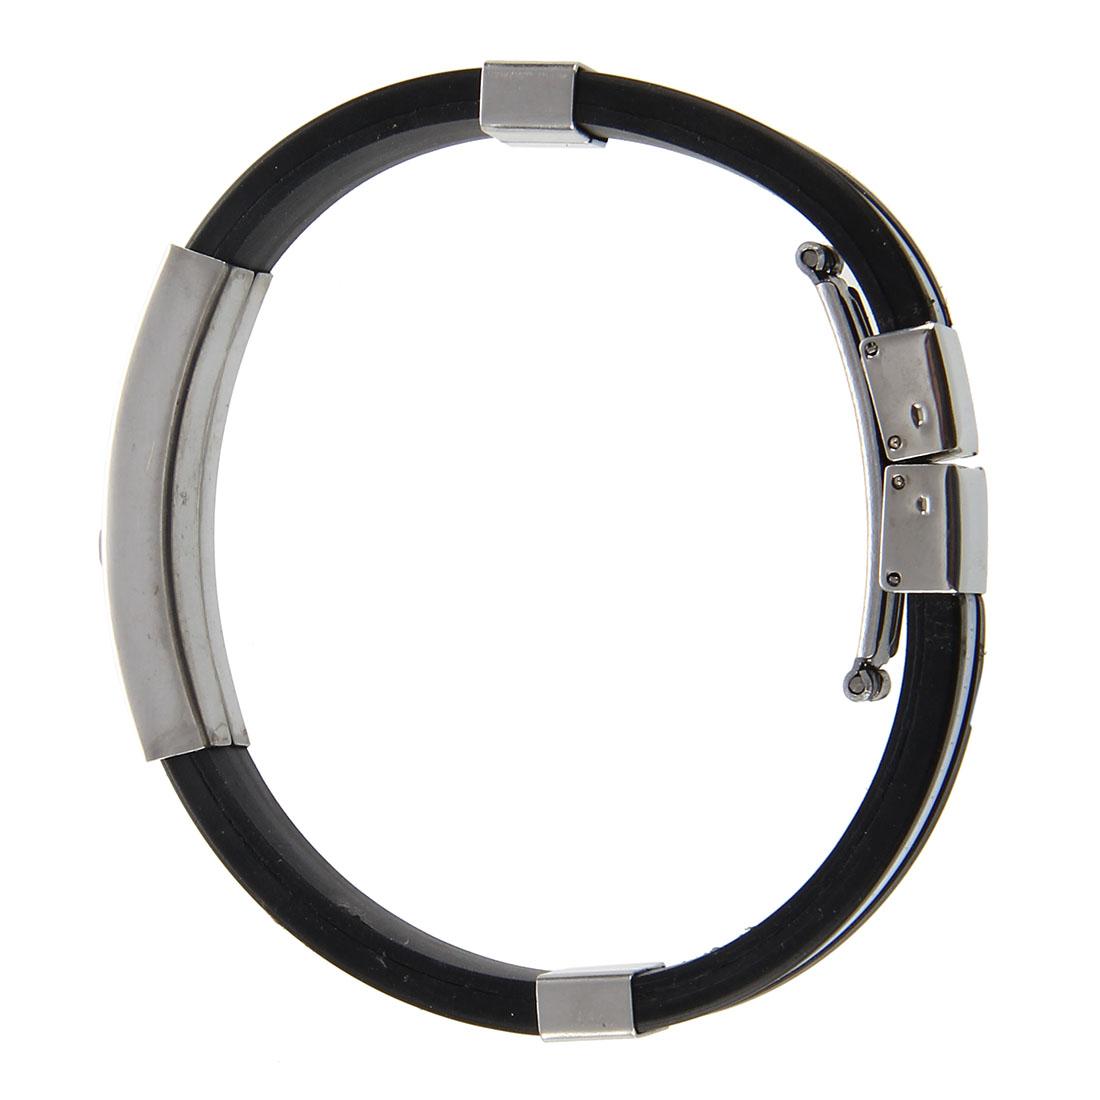 Stainless steel cross black white silicone bracelet